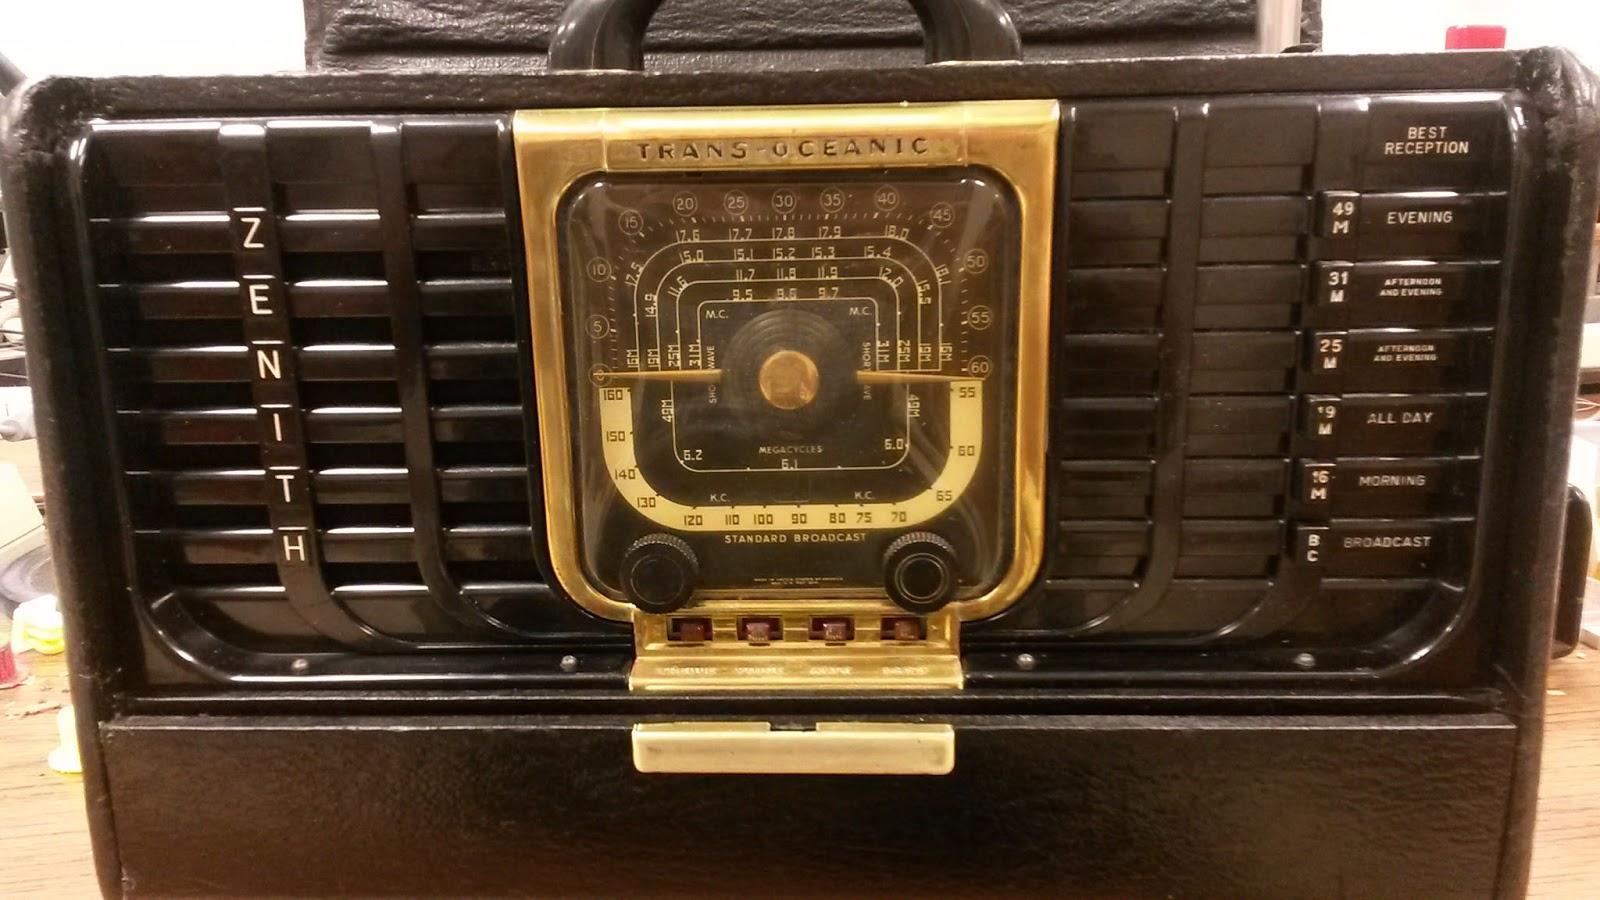 Robert's Projects 1948 Zenith Transoceanic Radio. 1948 Zenith Transoceanic Radio. Wiring. Zenith Trans Oceanic Tube Radio Schematics At Scoala.co